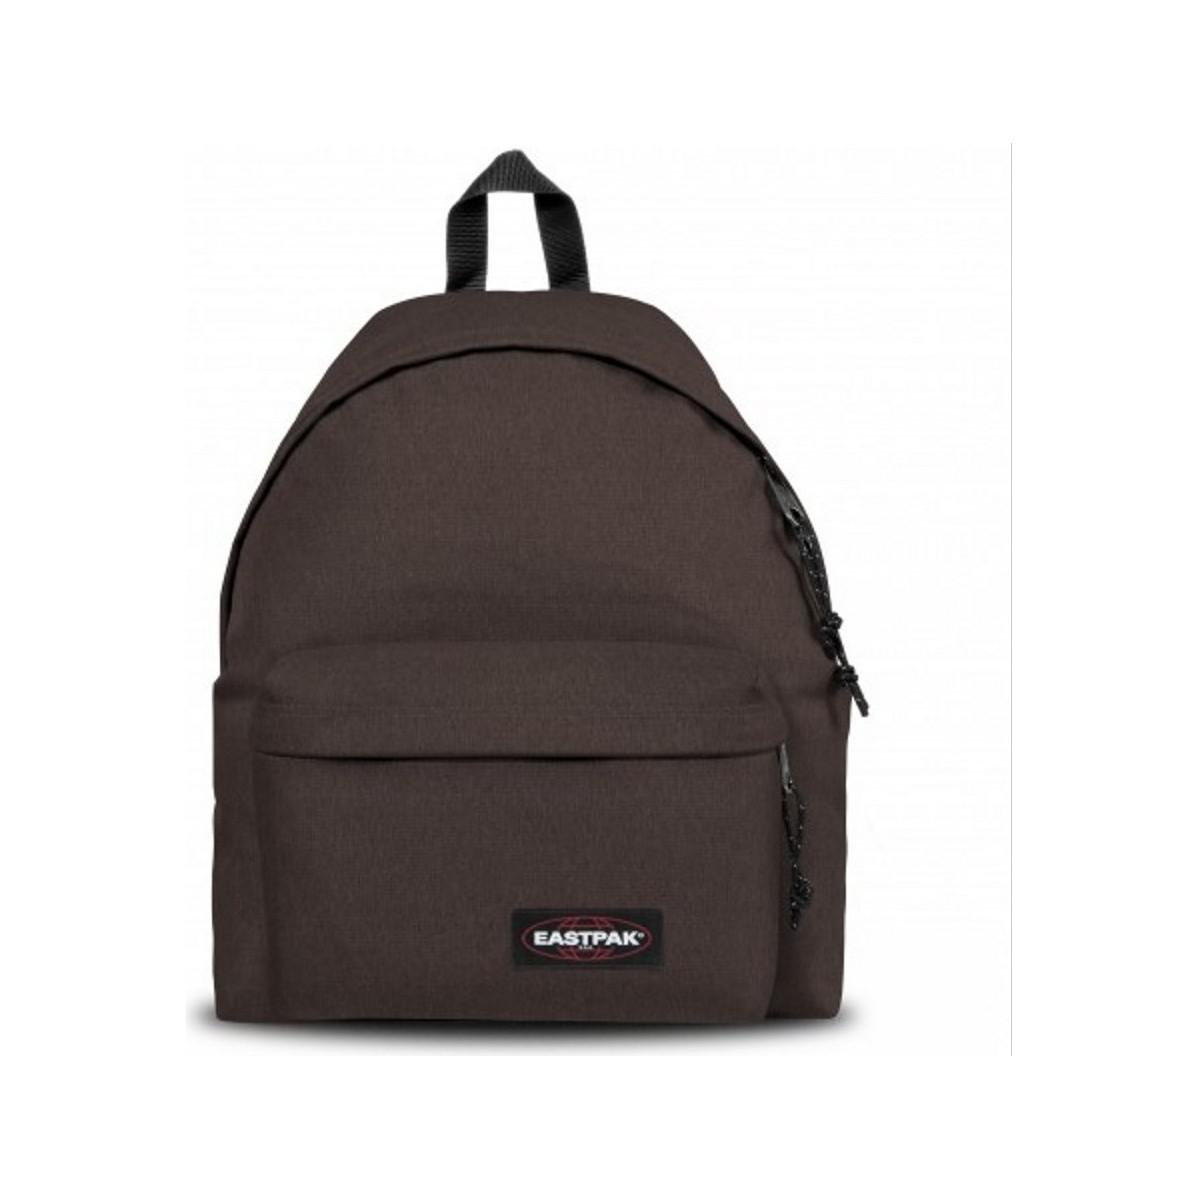 Eastpak Padded Pak'r Backpack - Crafty Brown Men's Backpack In Grey in Grey for Men